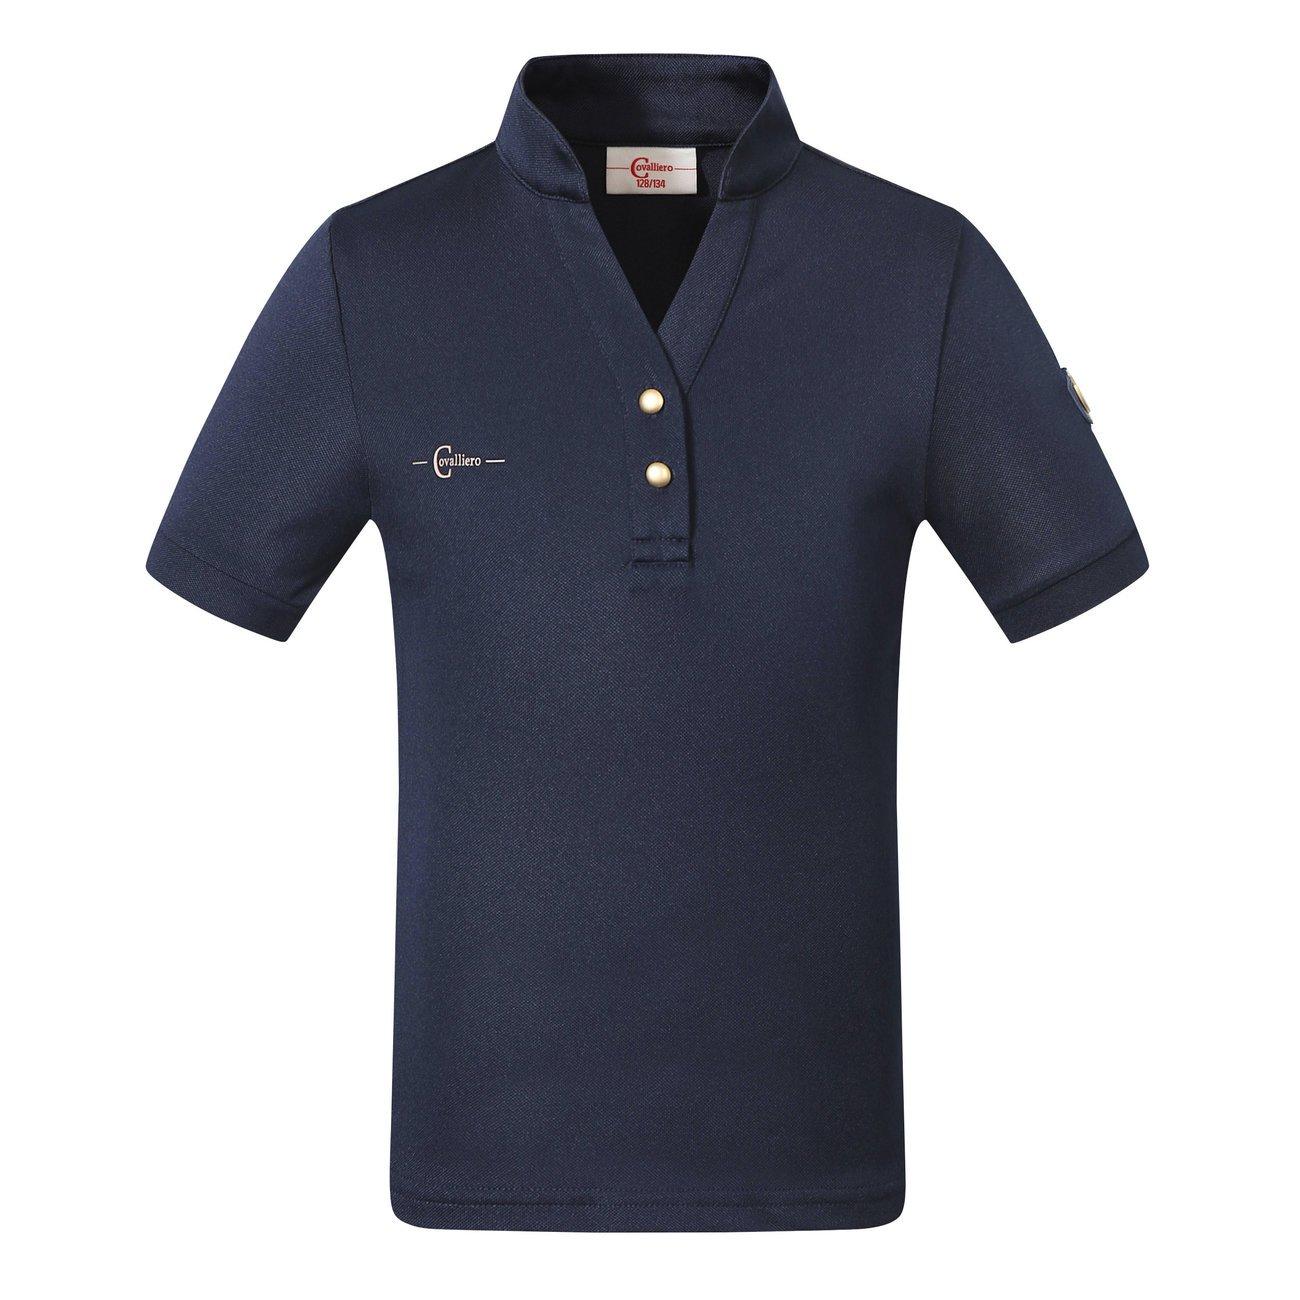 Kerbl Kinder Poloshirt Trendy, Gr. 152/158, navy